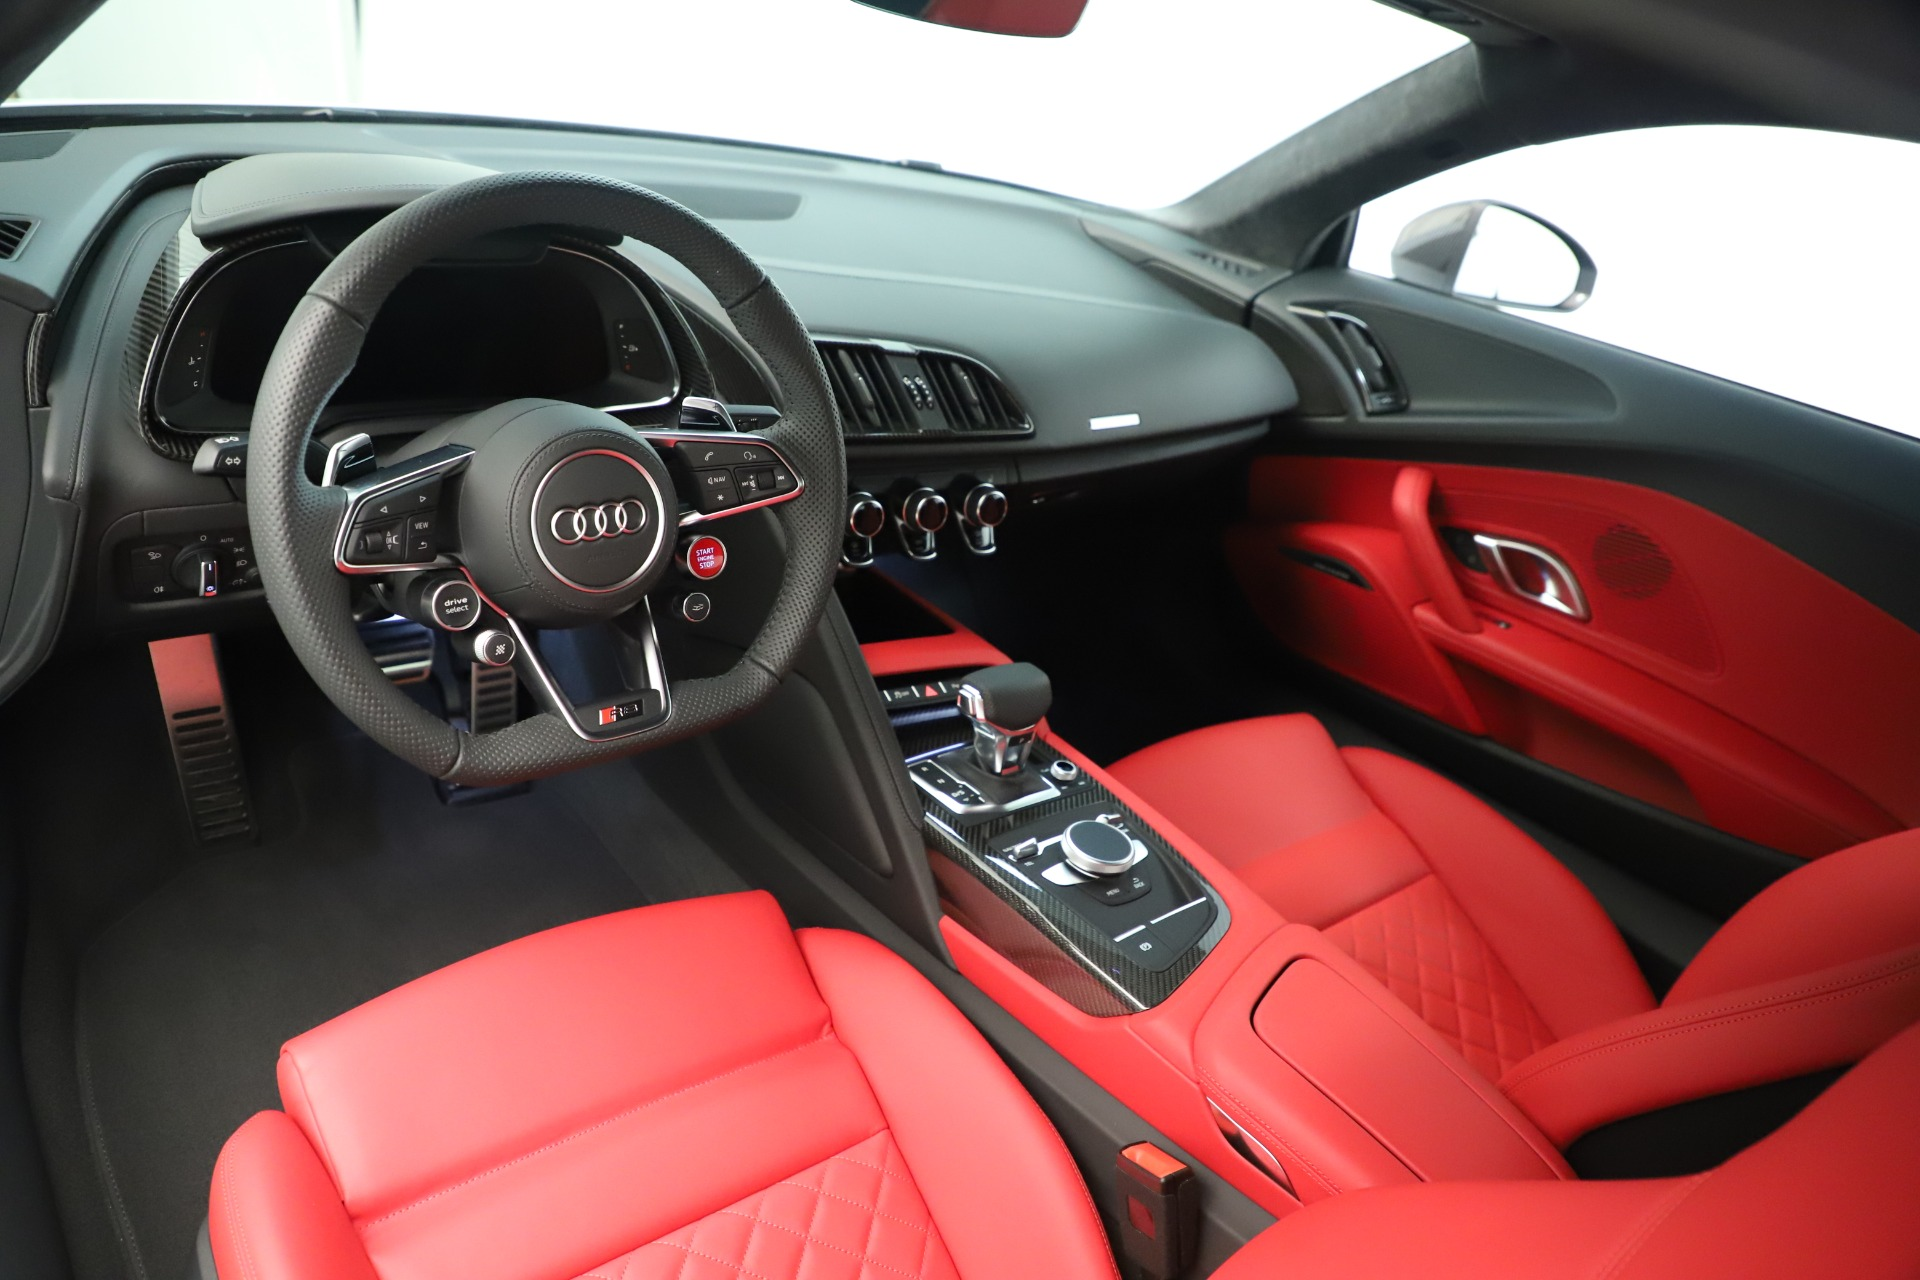 Used 2018 Audi R8 5.2 quattro V10 Plus For Sale In Greenwich, CT 3360_p14